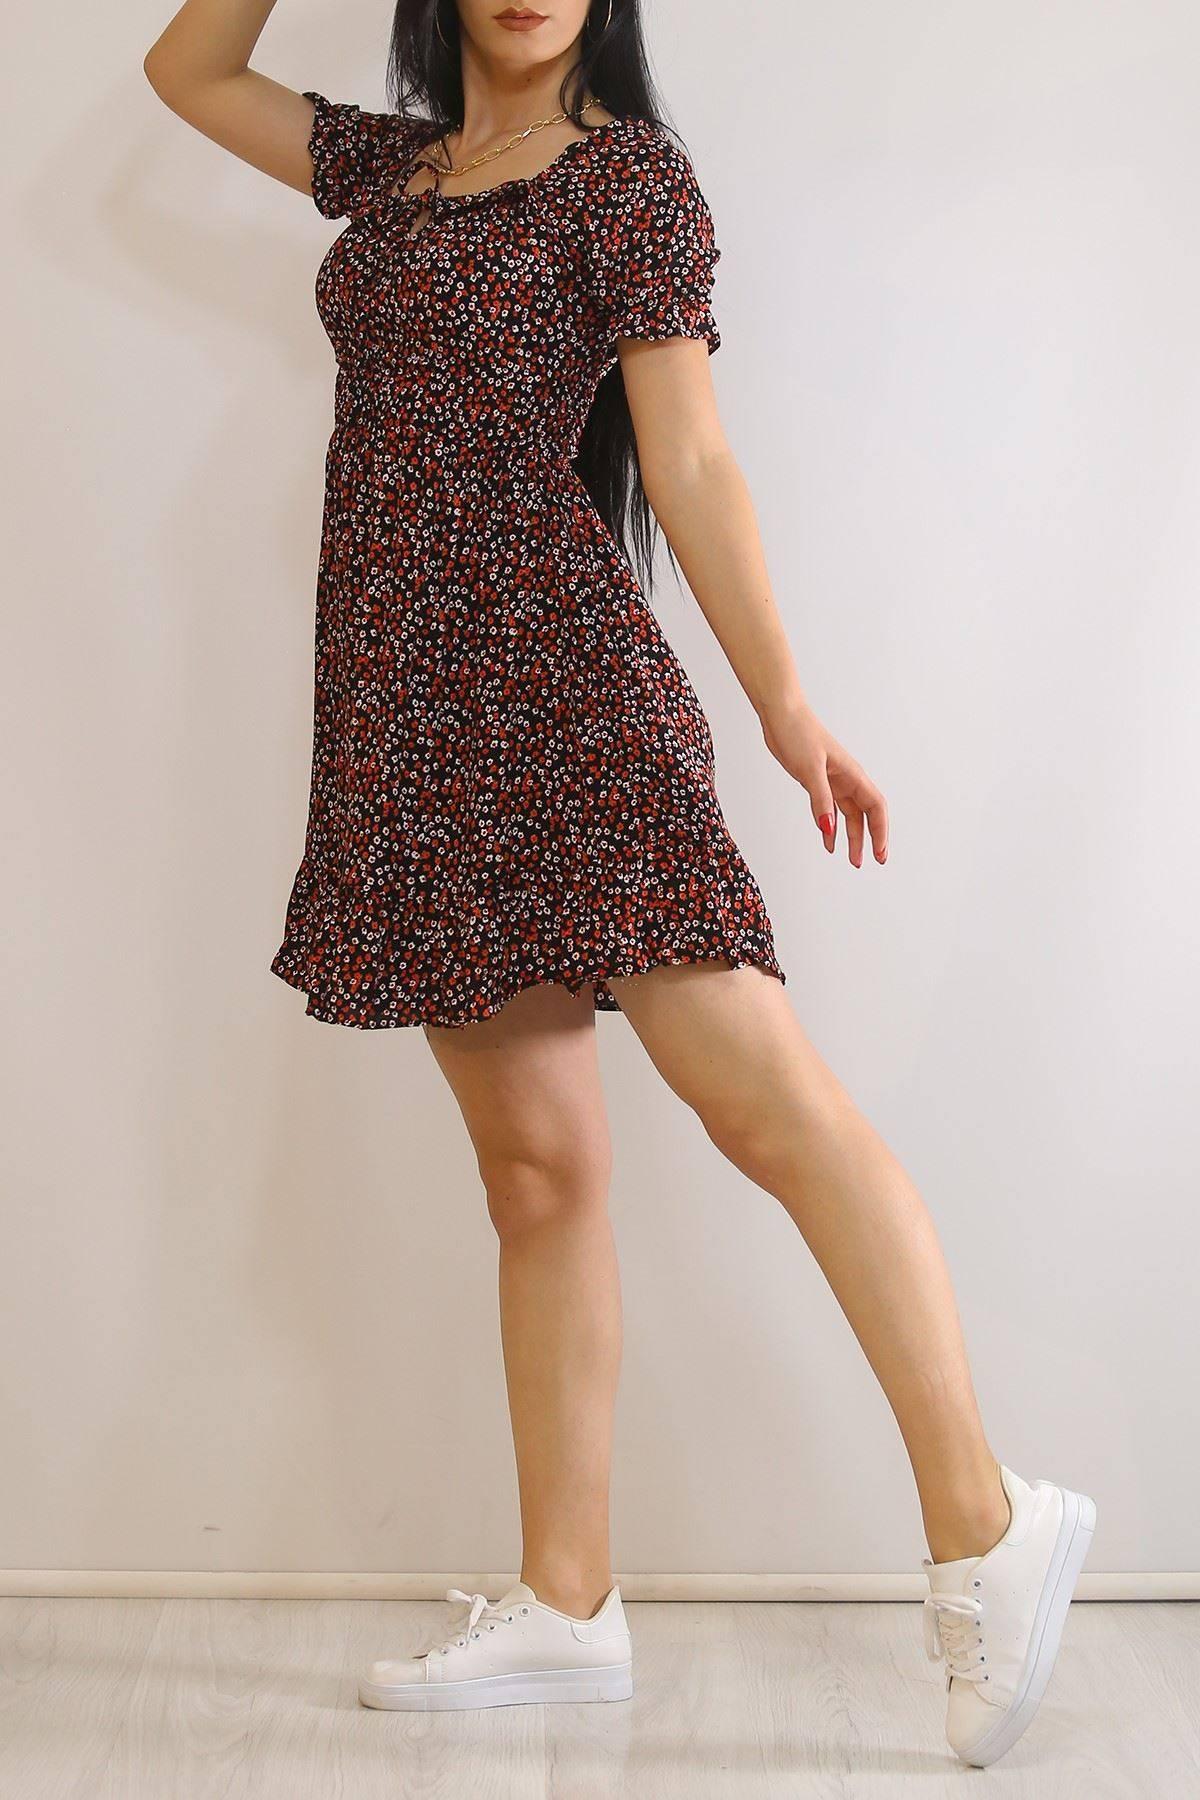 Desenli Elbise Siyah - 5964.1254.